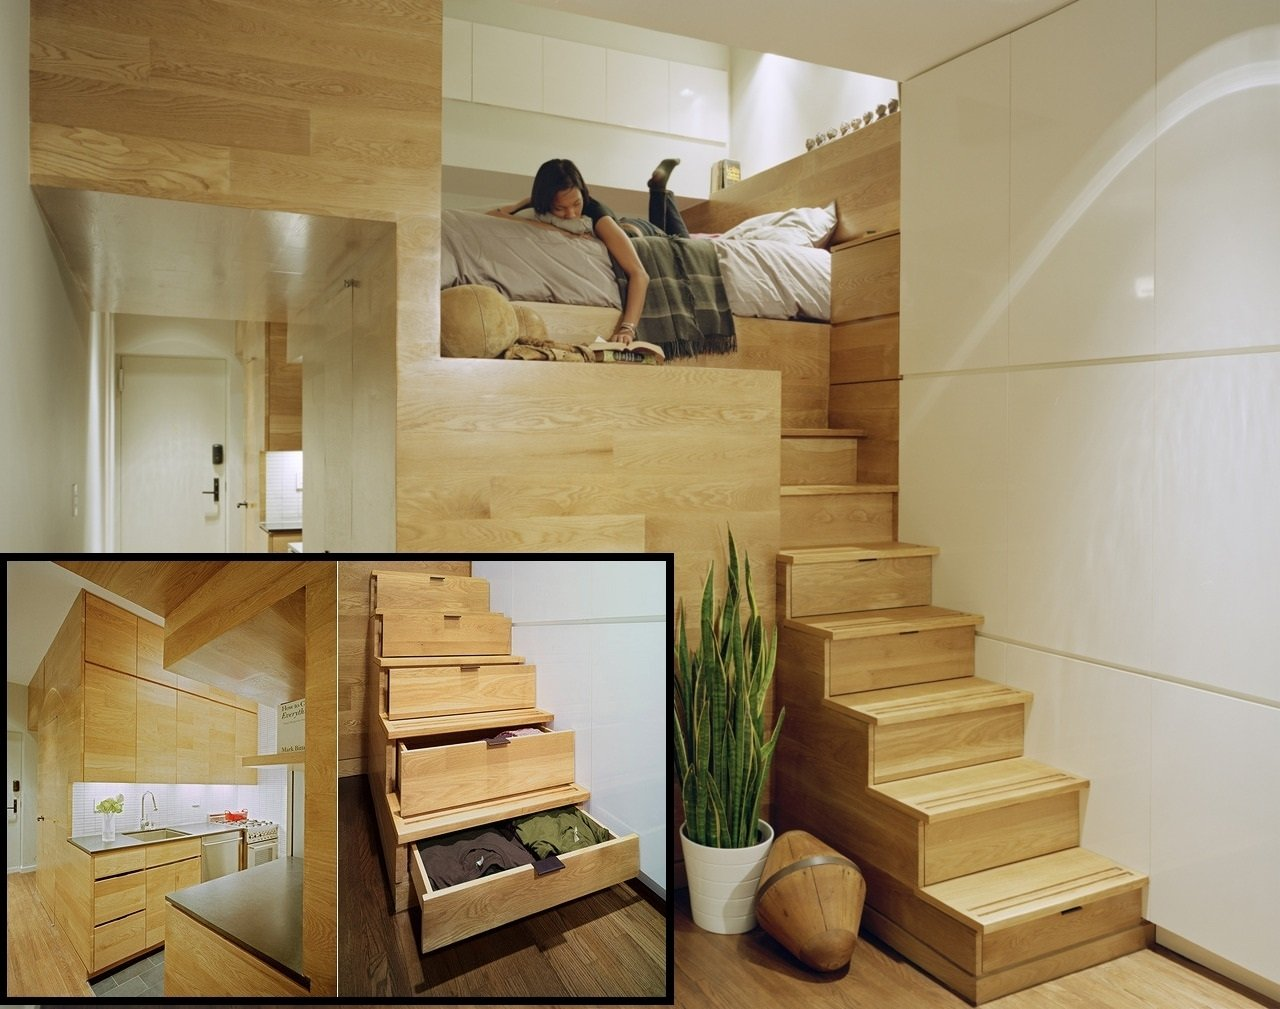 10 Gorgeous Interior Design Ideas For Small Spaces staircase ideas for small spaces apartment interior design 1